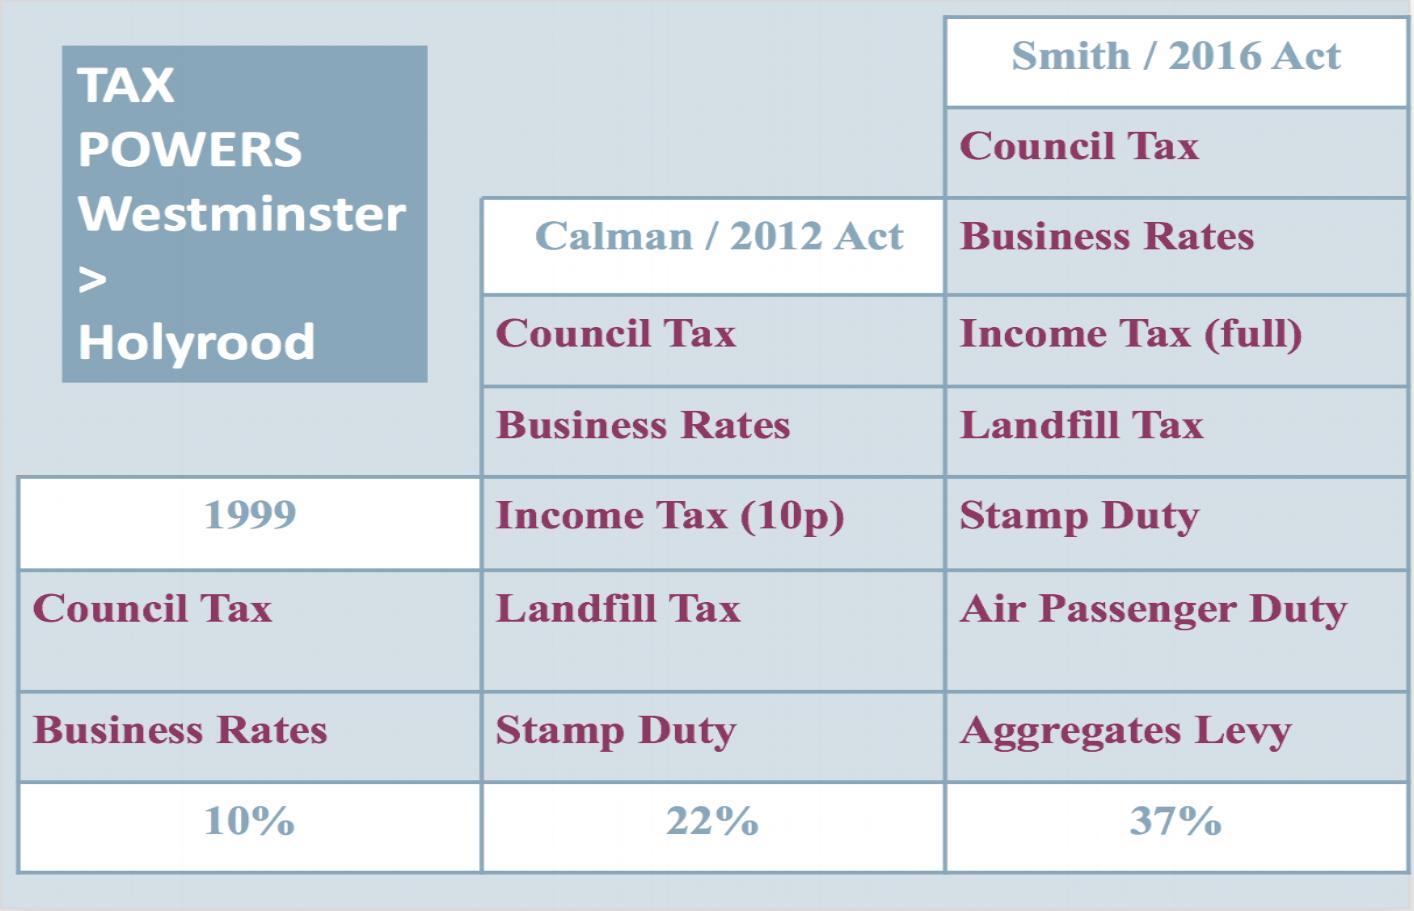 Source: Reform Scotland